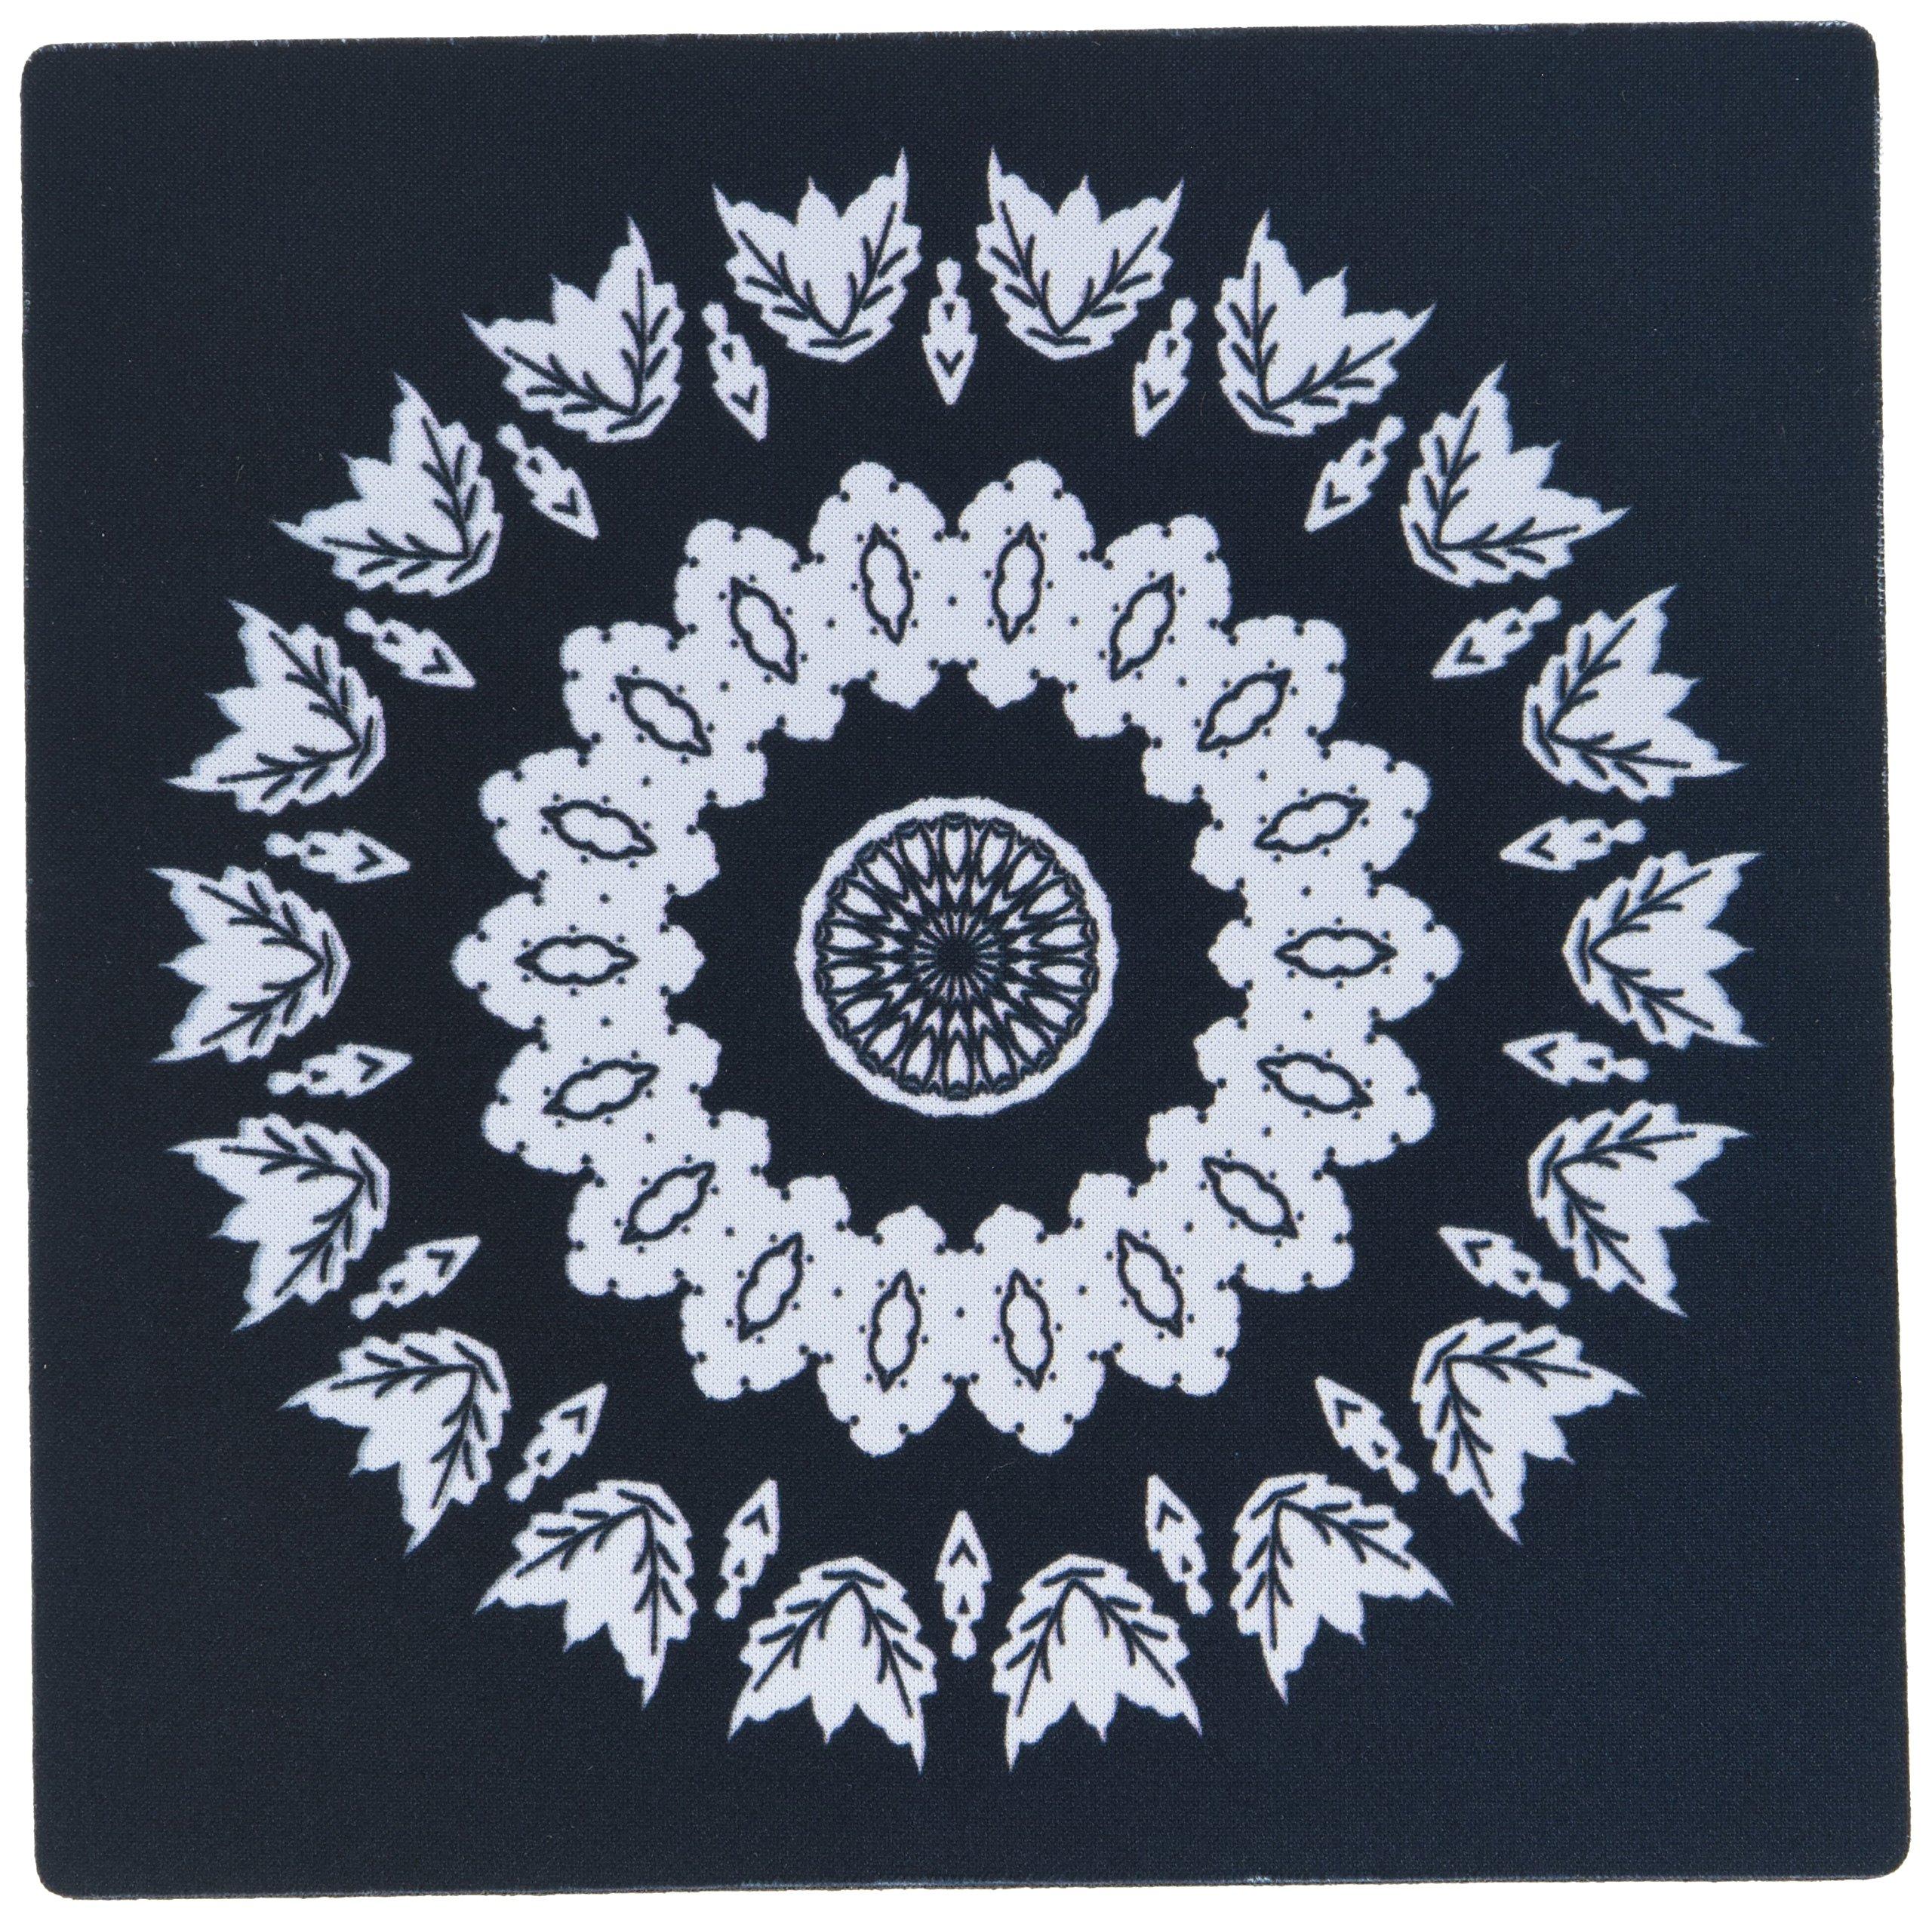 3dRose Black and White Floral Mandala On Black Backgrond Mouse Pad (mp_41998_1)